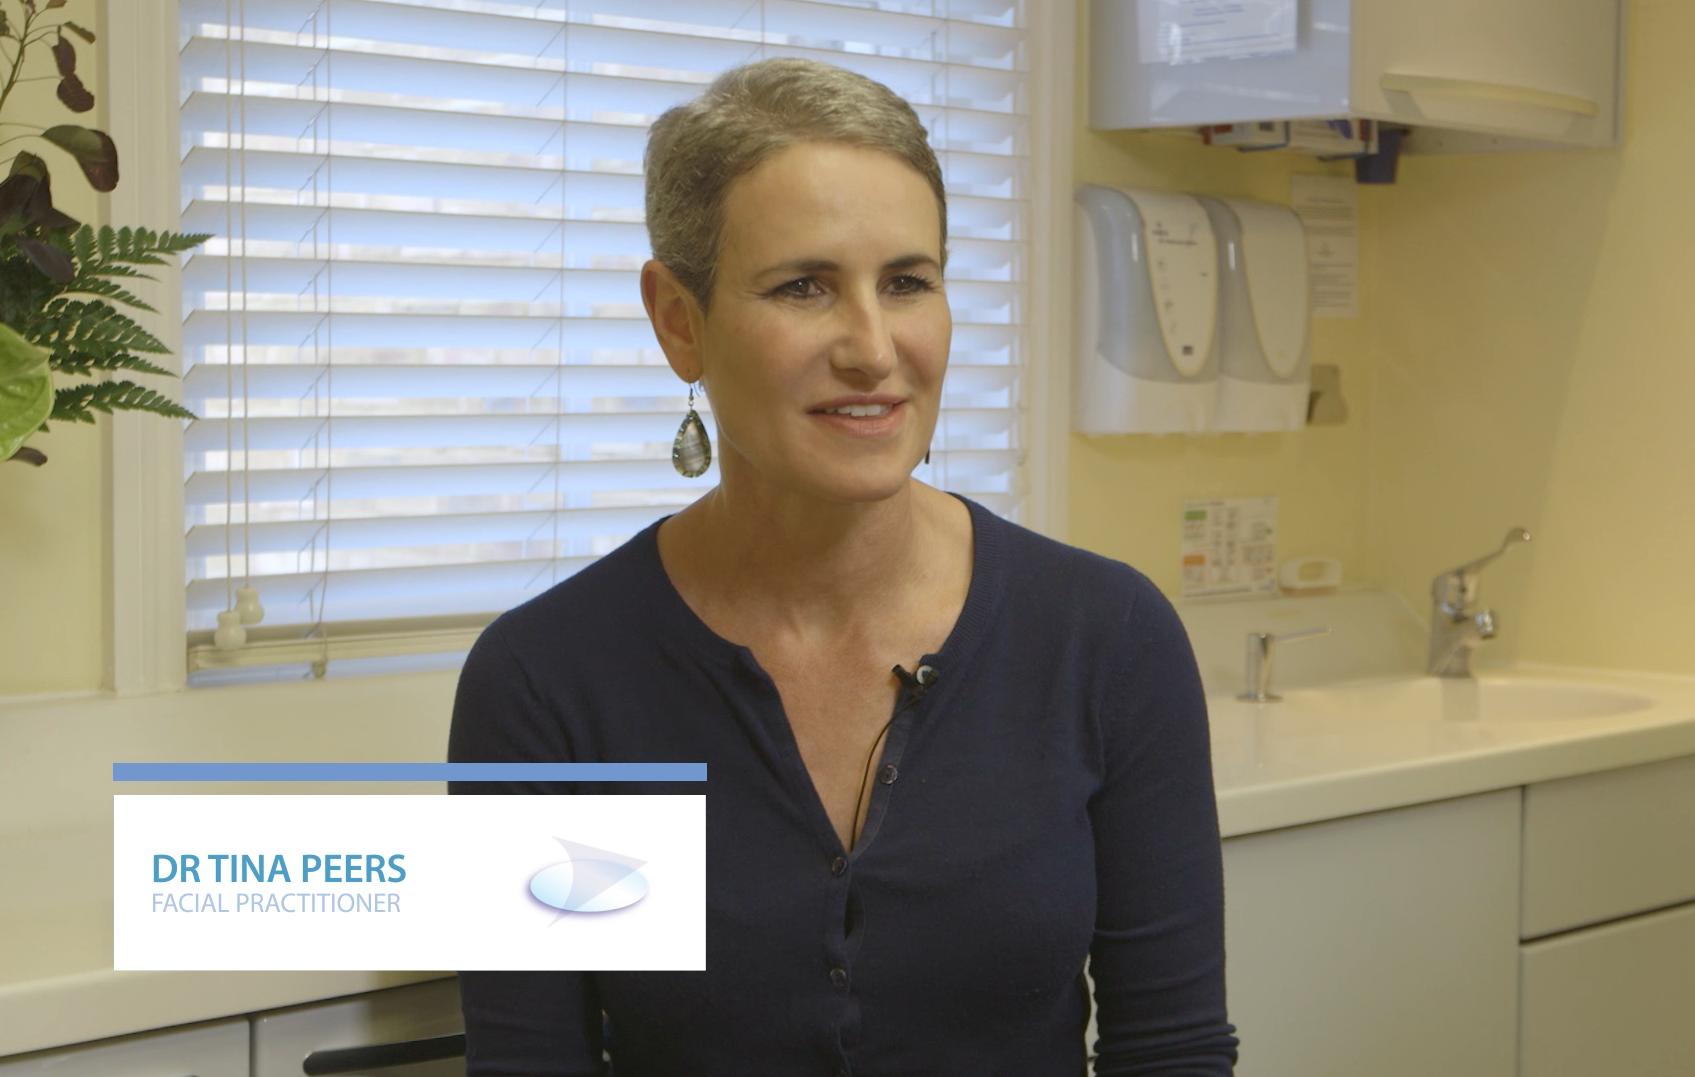 Dr Tina Peers talks about facial rejuvenation treatments